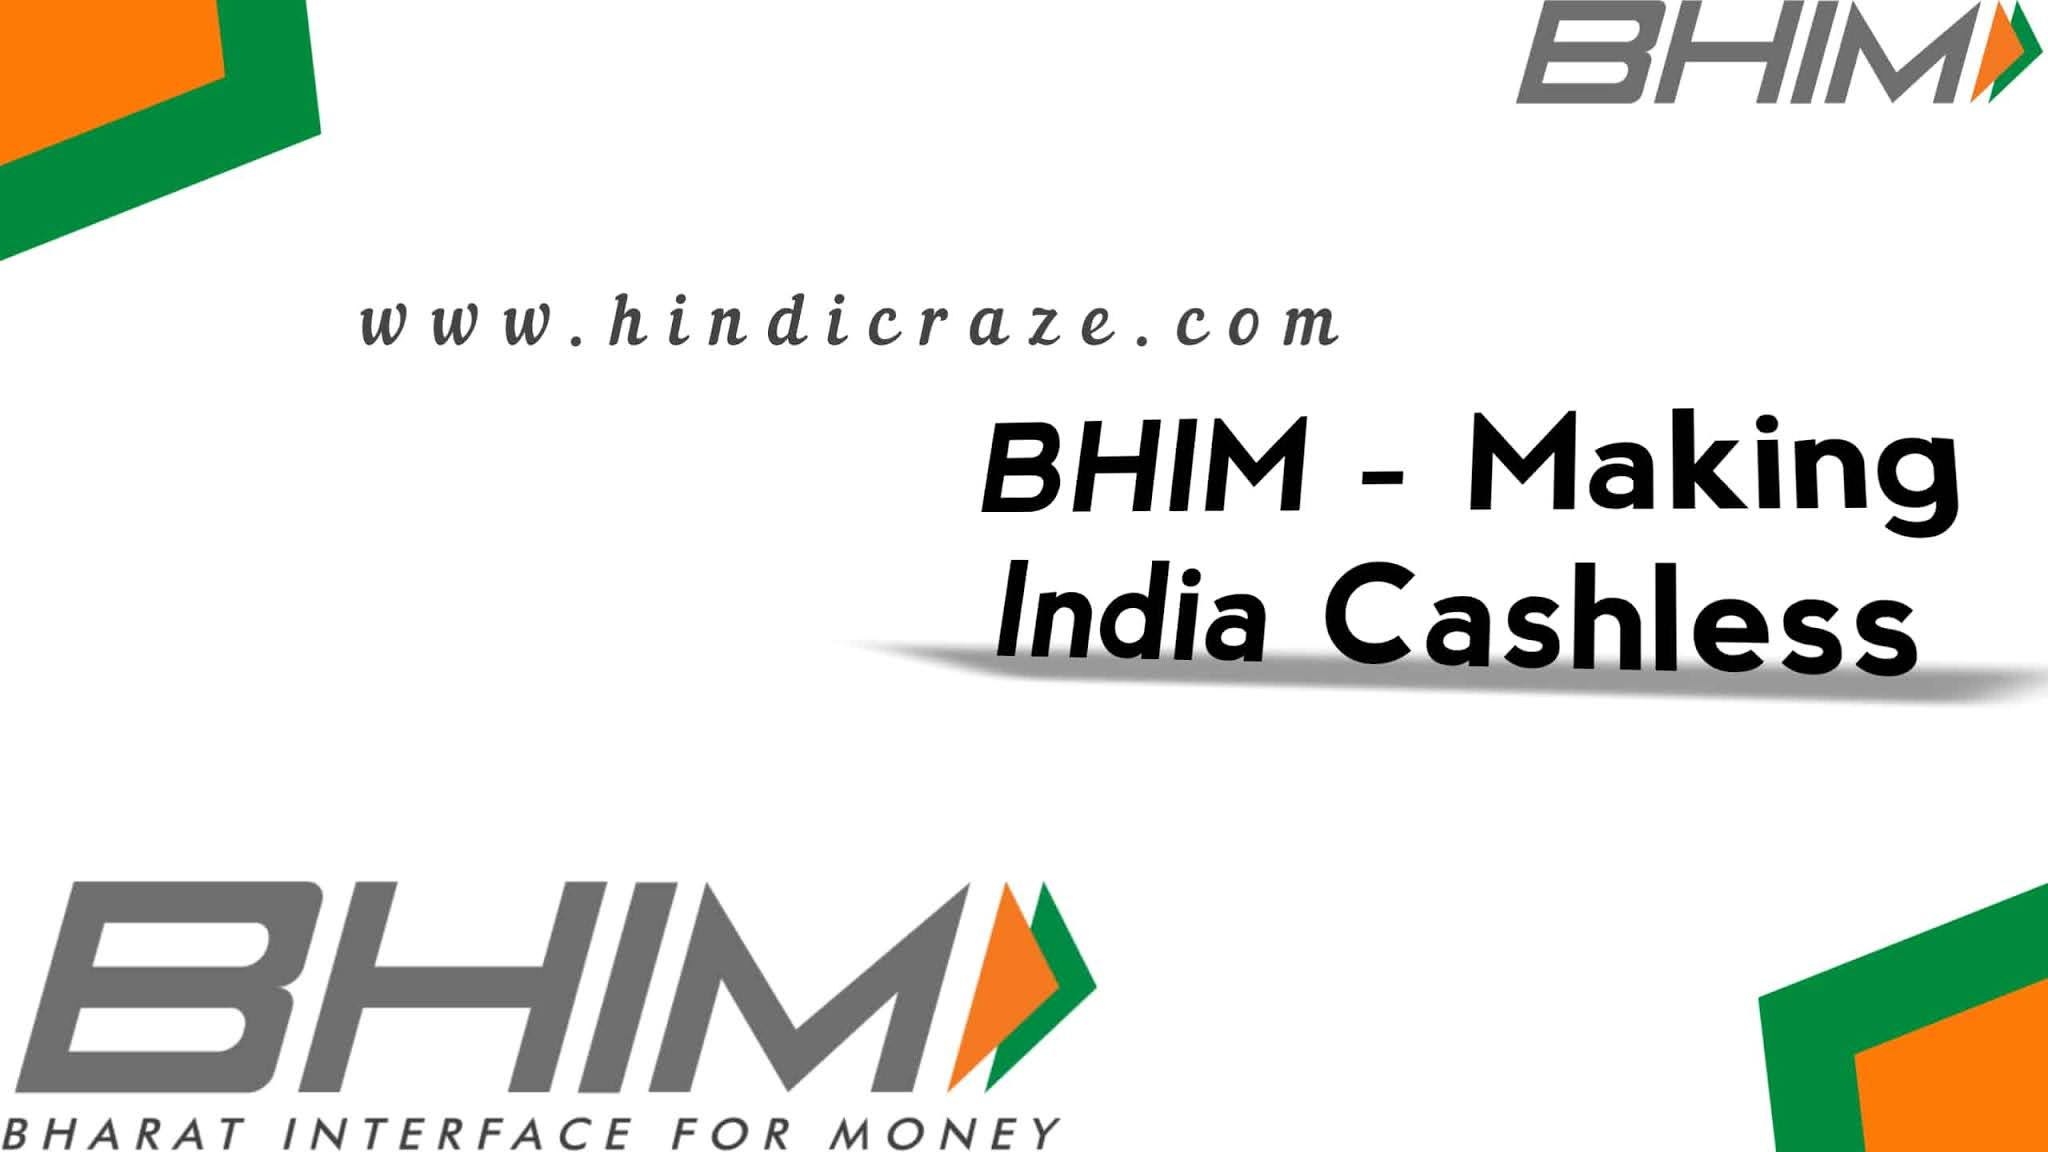 Best UPI Payments App In India 2020 - Bhim upi